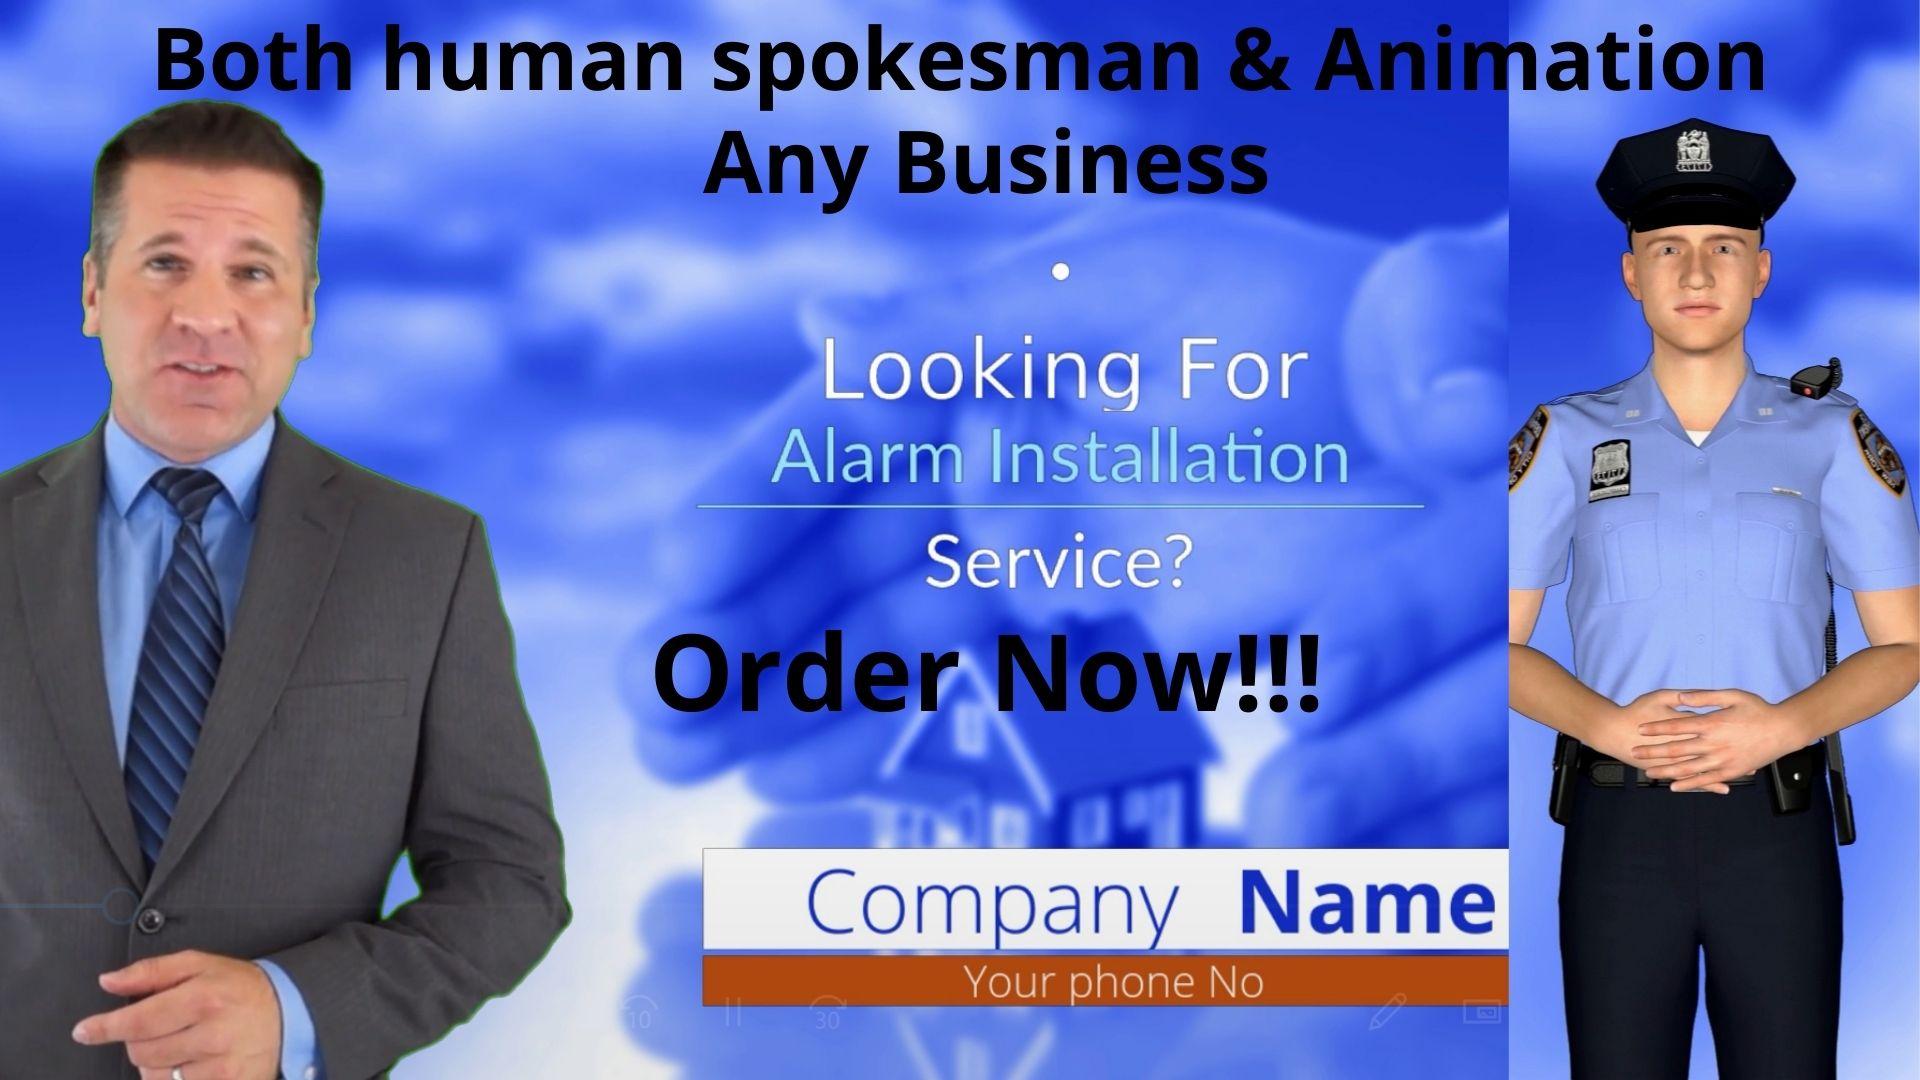 Professional Animation and human spokesman video ads